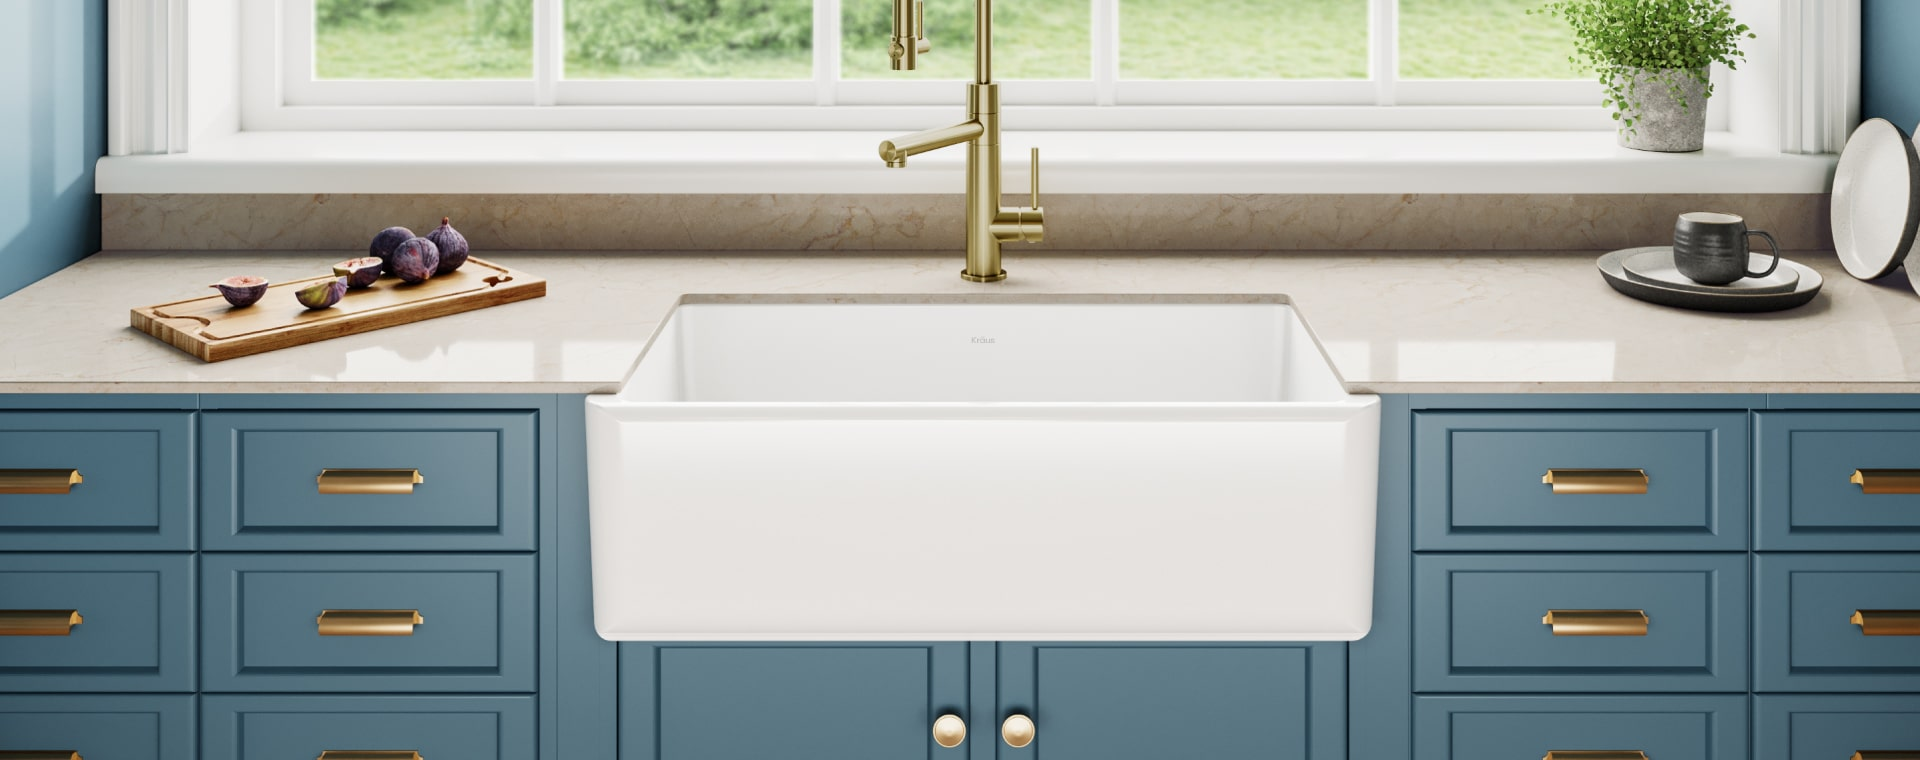 a farmhouse sink ikea kitchen can